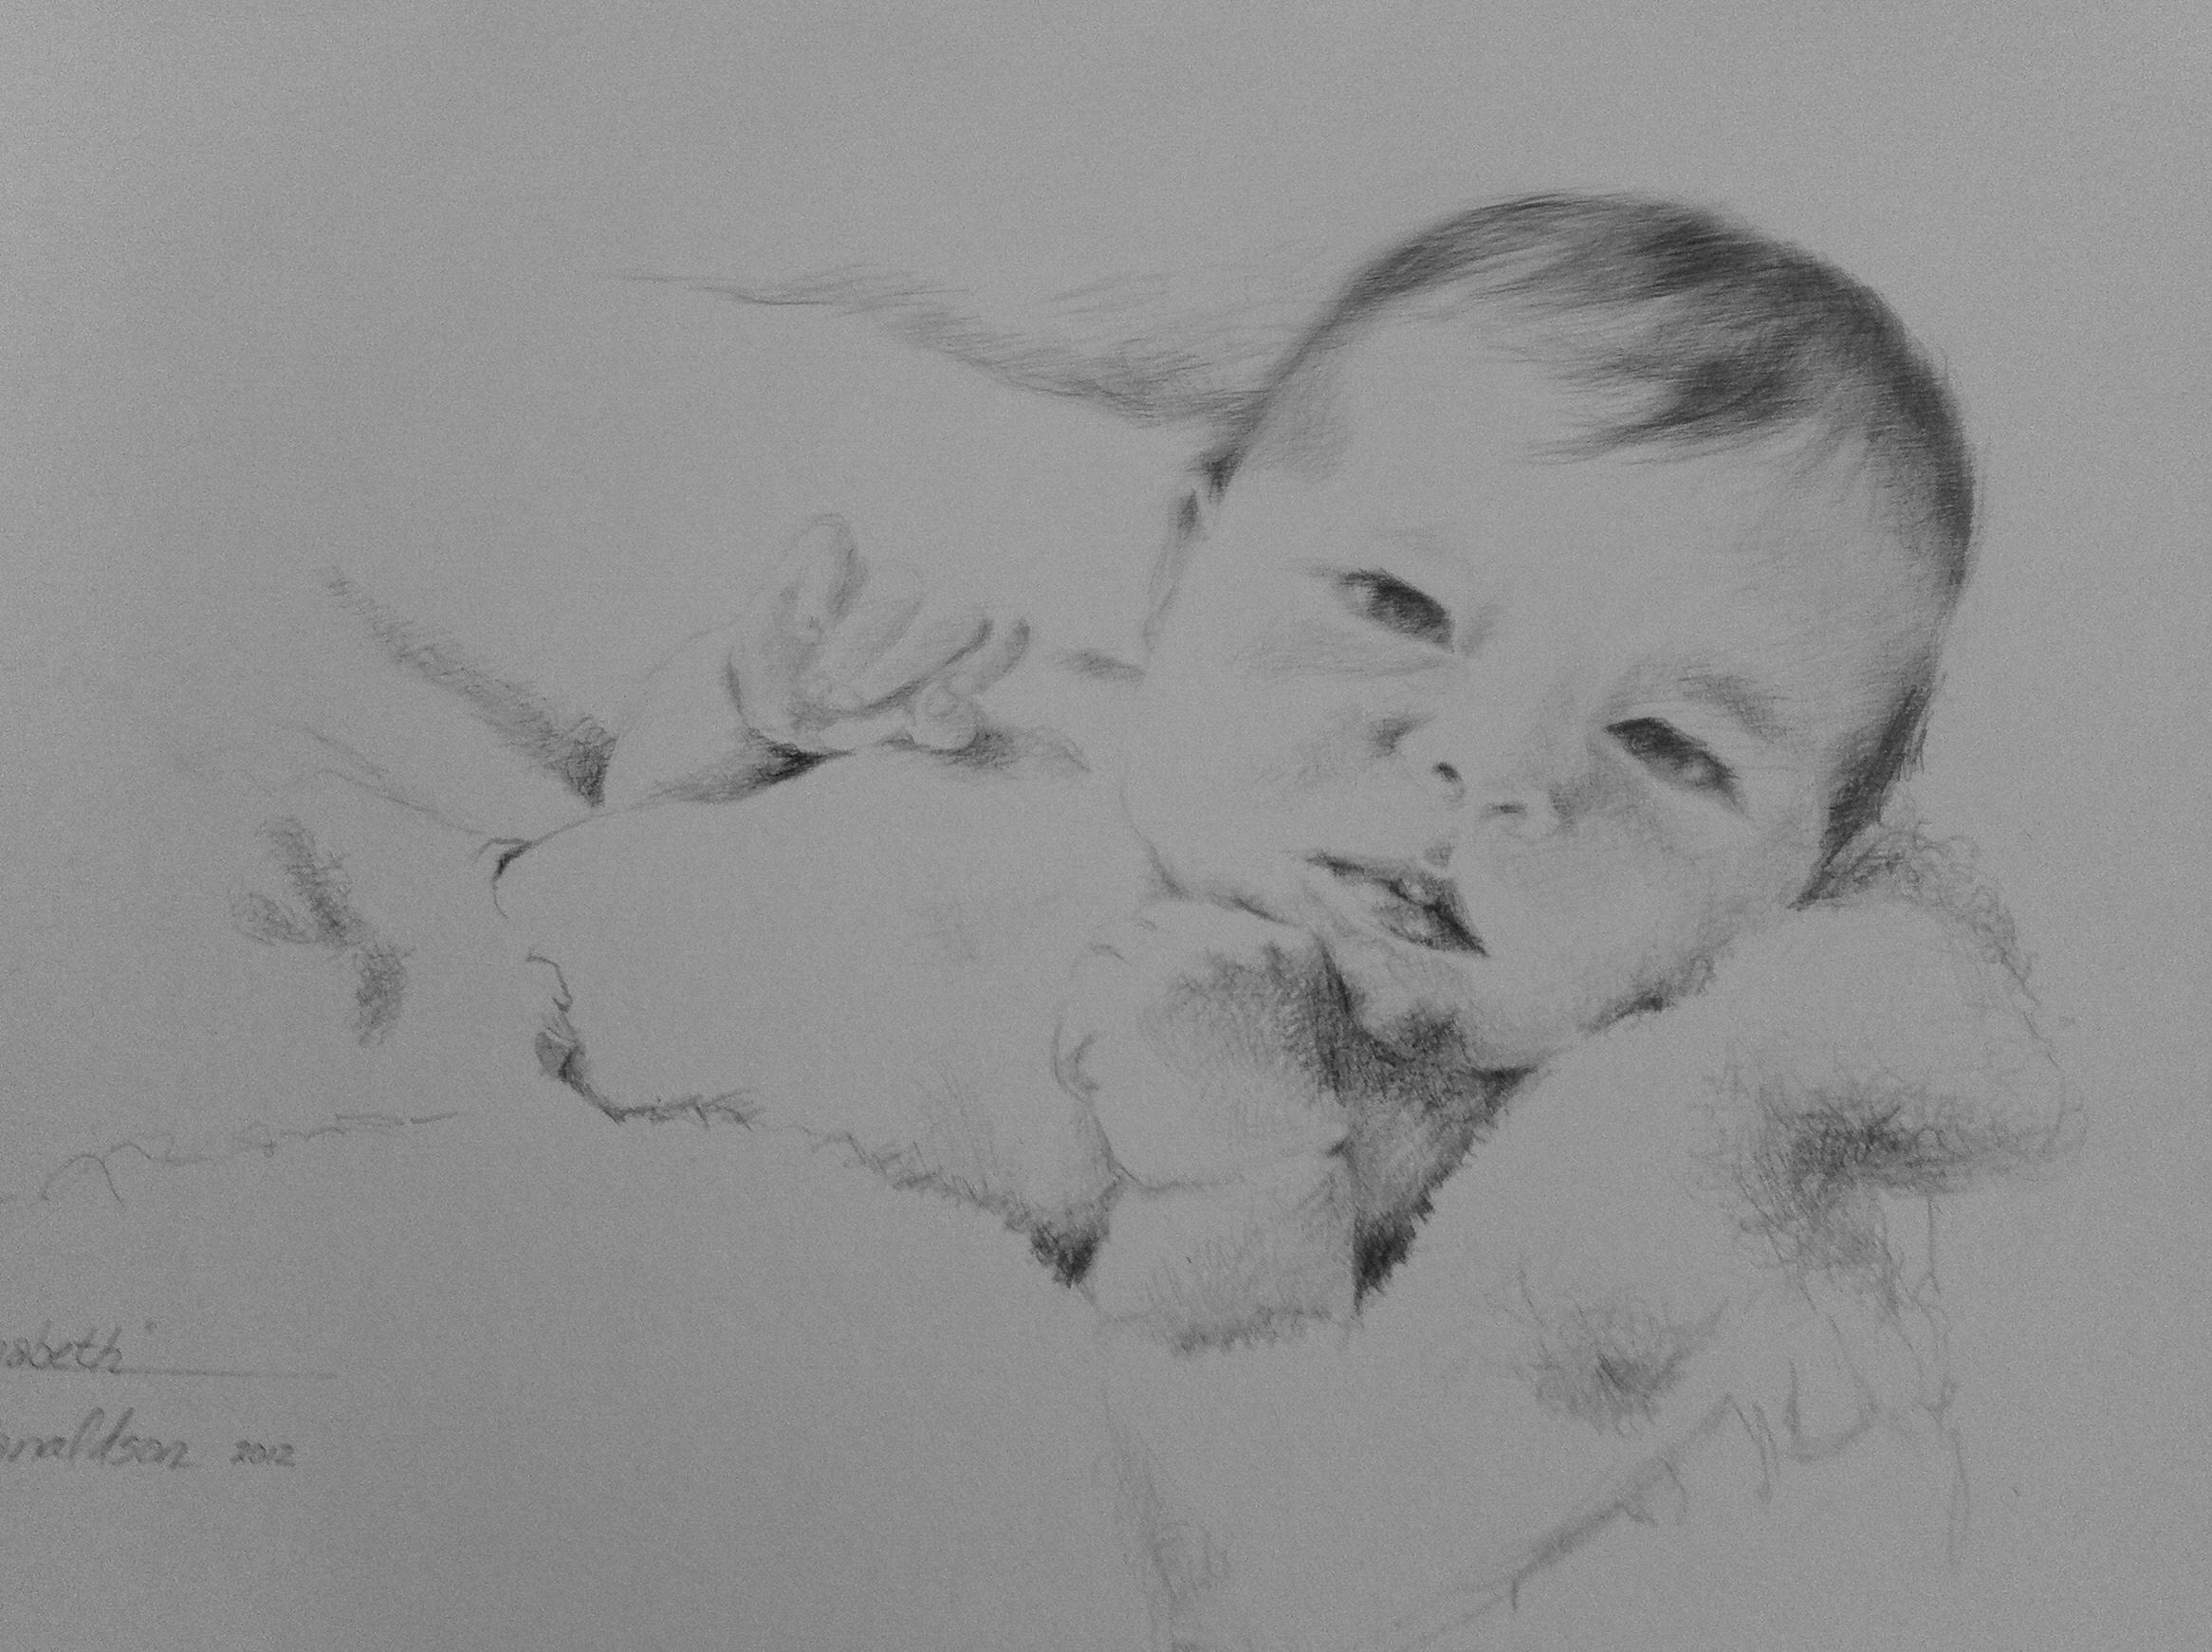 Baby Portraits, graphite pencil